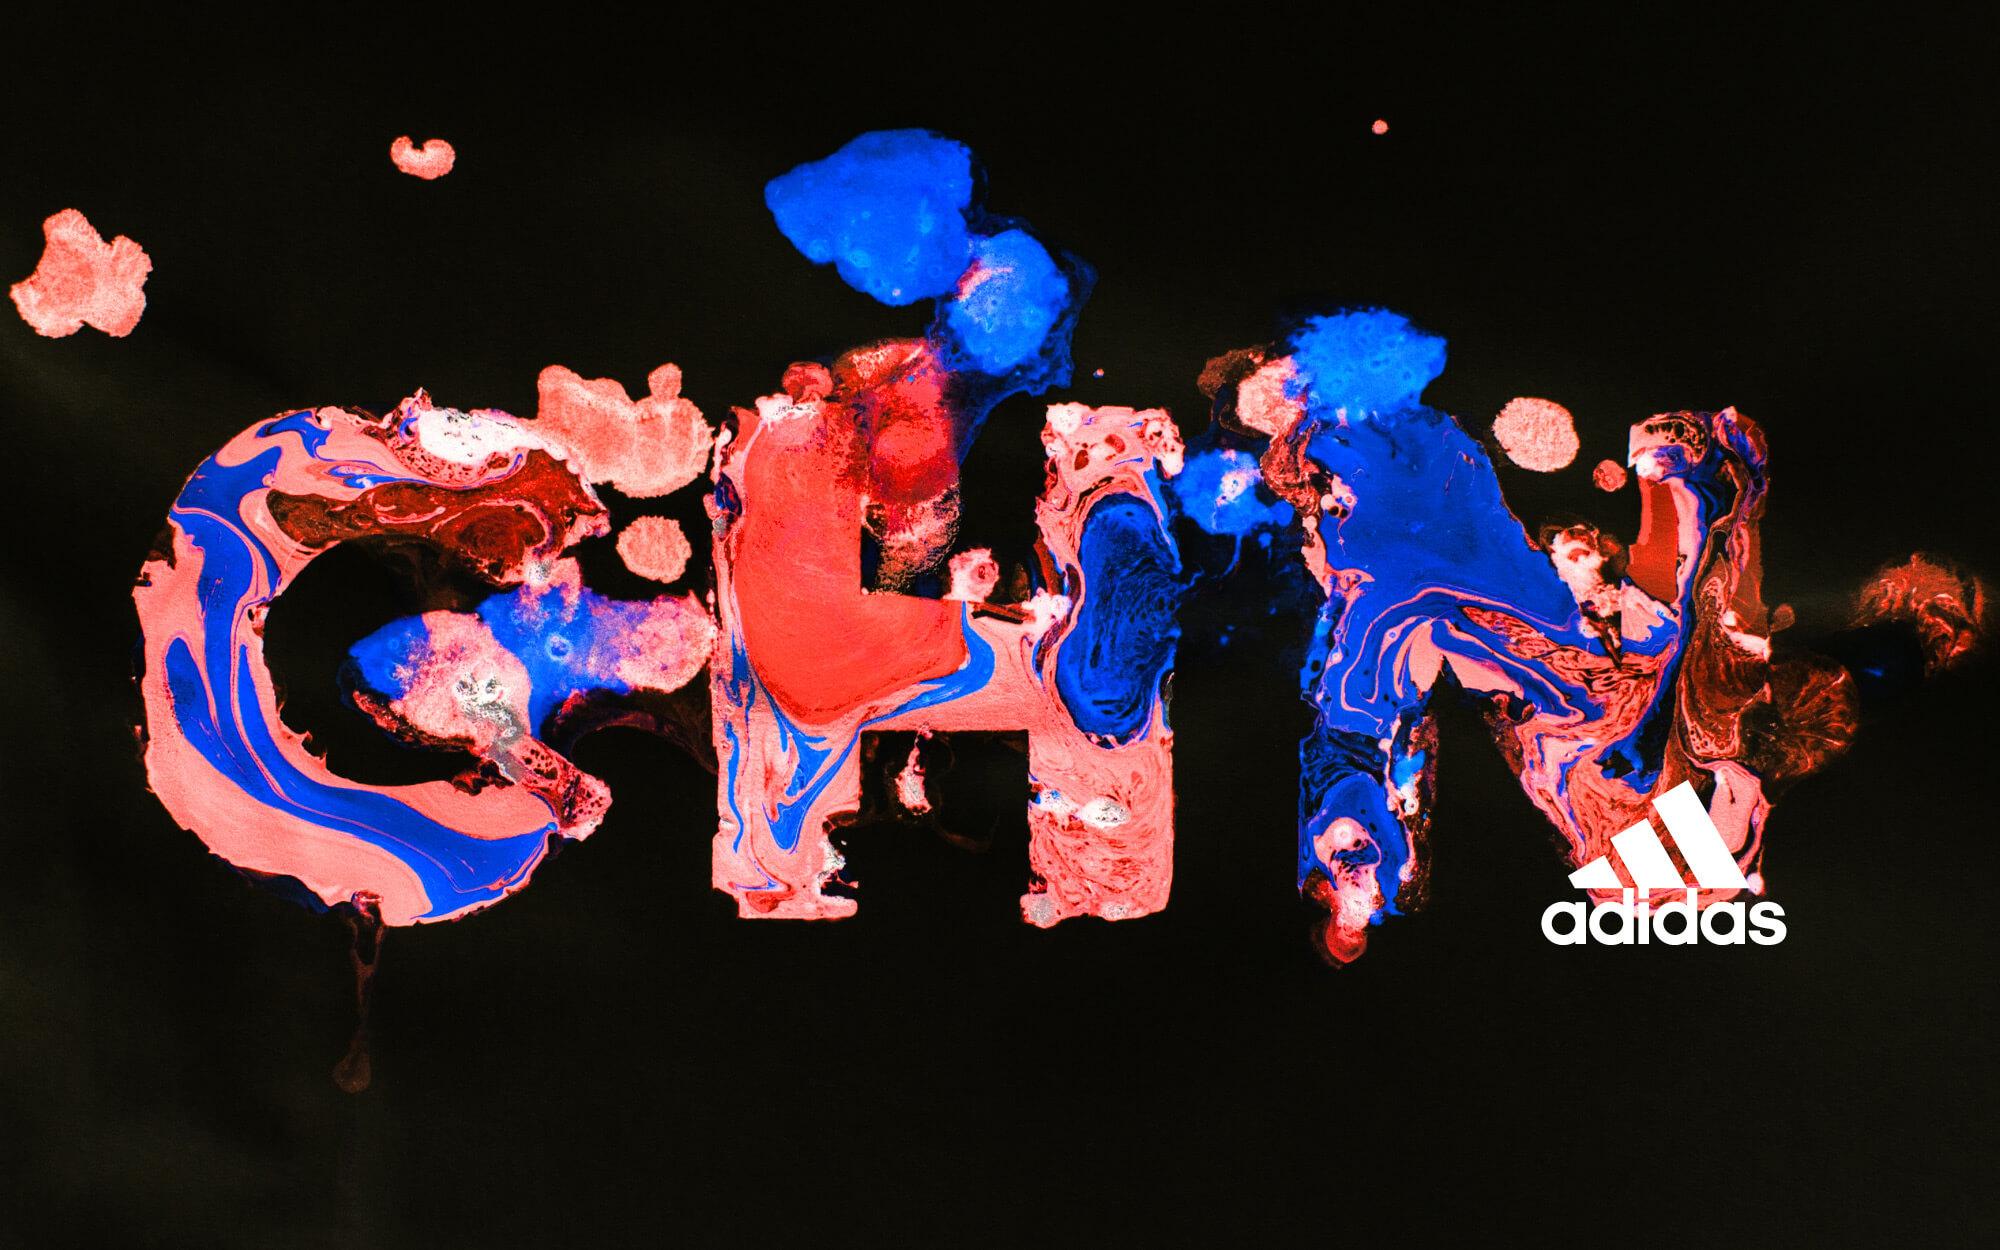 EIGA_adidas_TypeExploration_L_05